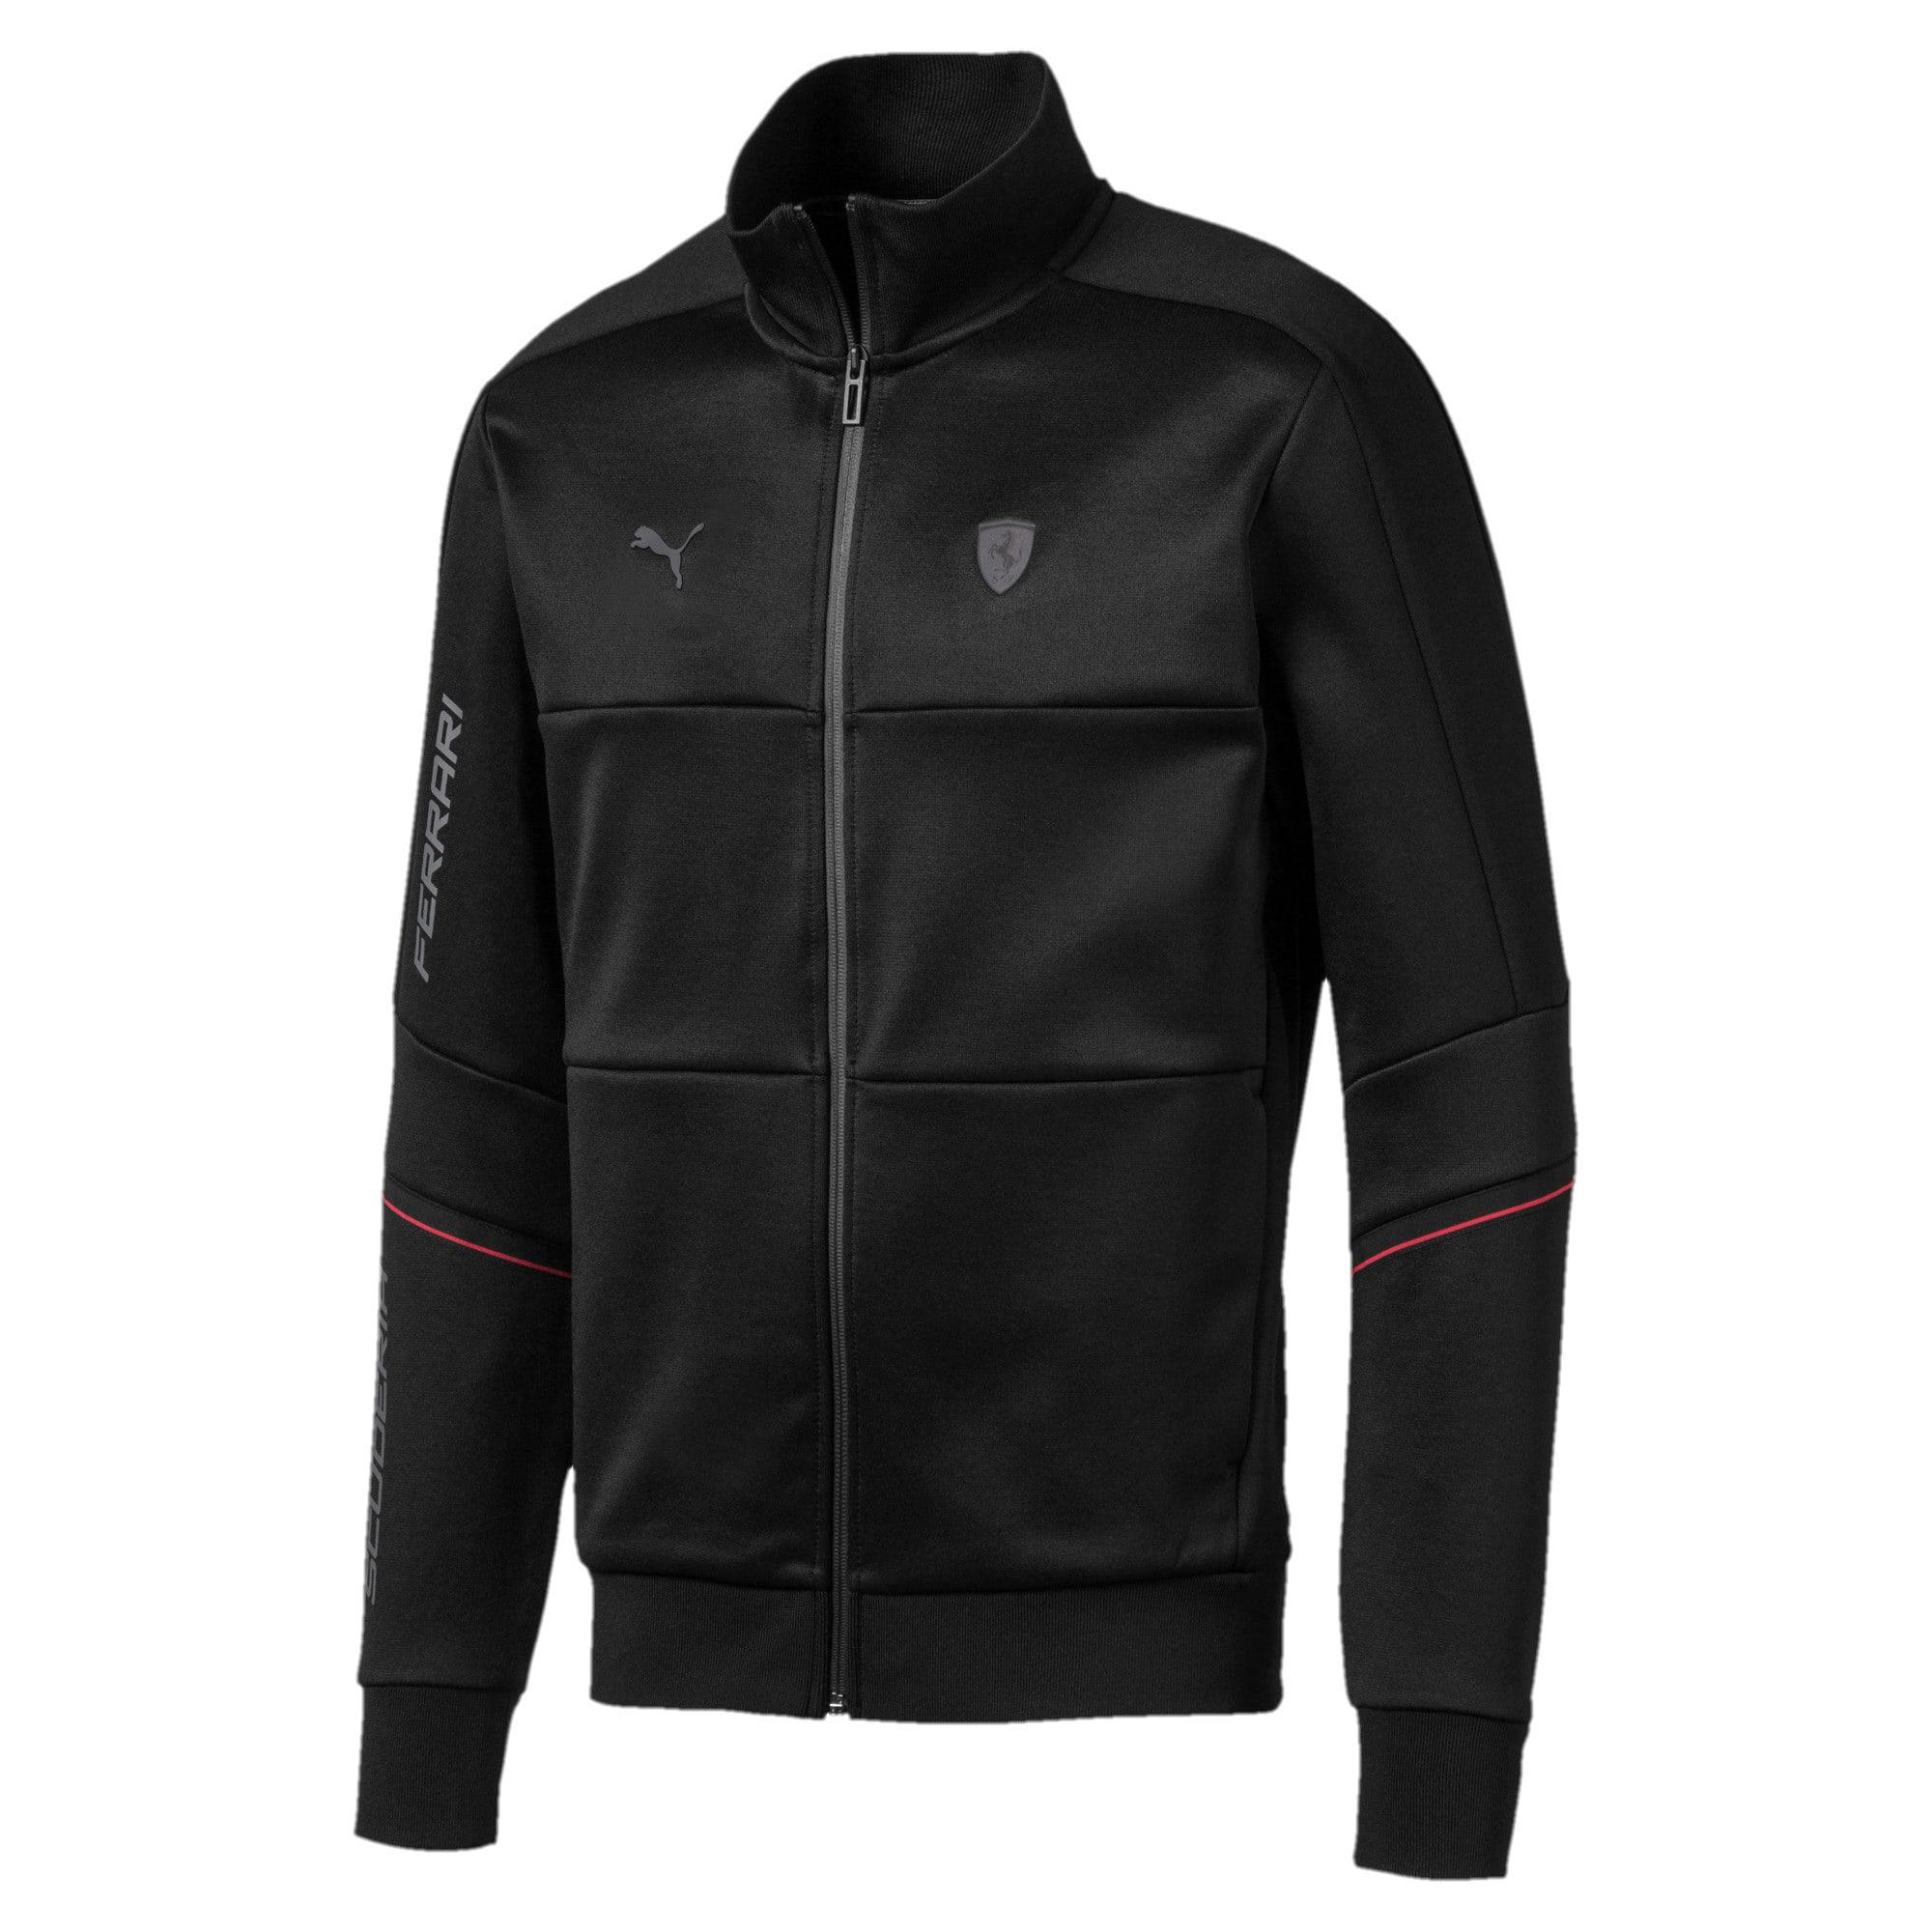 Thumbnail 4 of Ferrari Men's T7 Track Jacket, Puma Black, medium